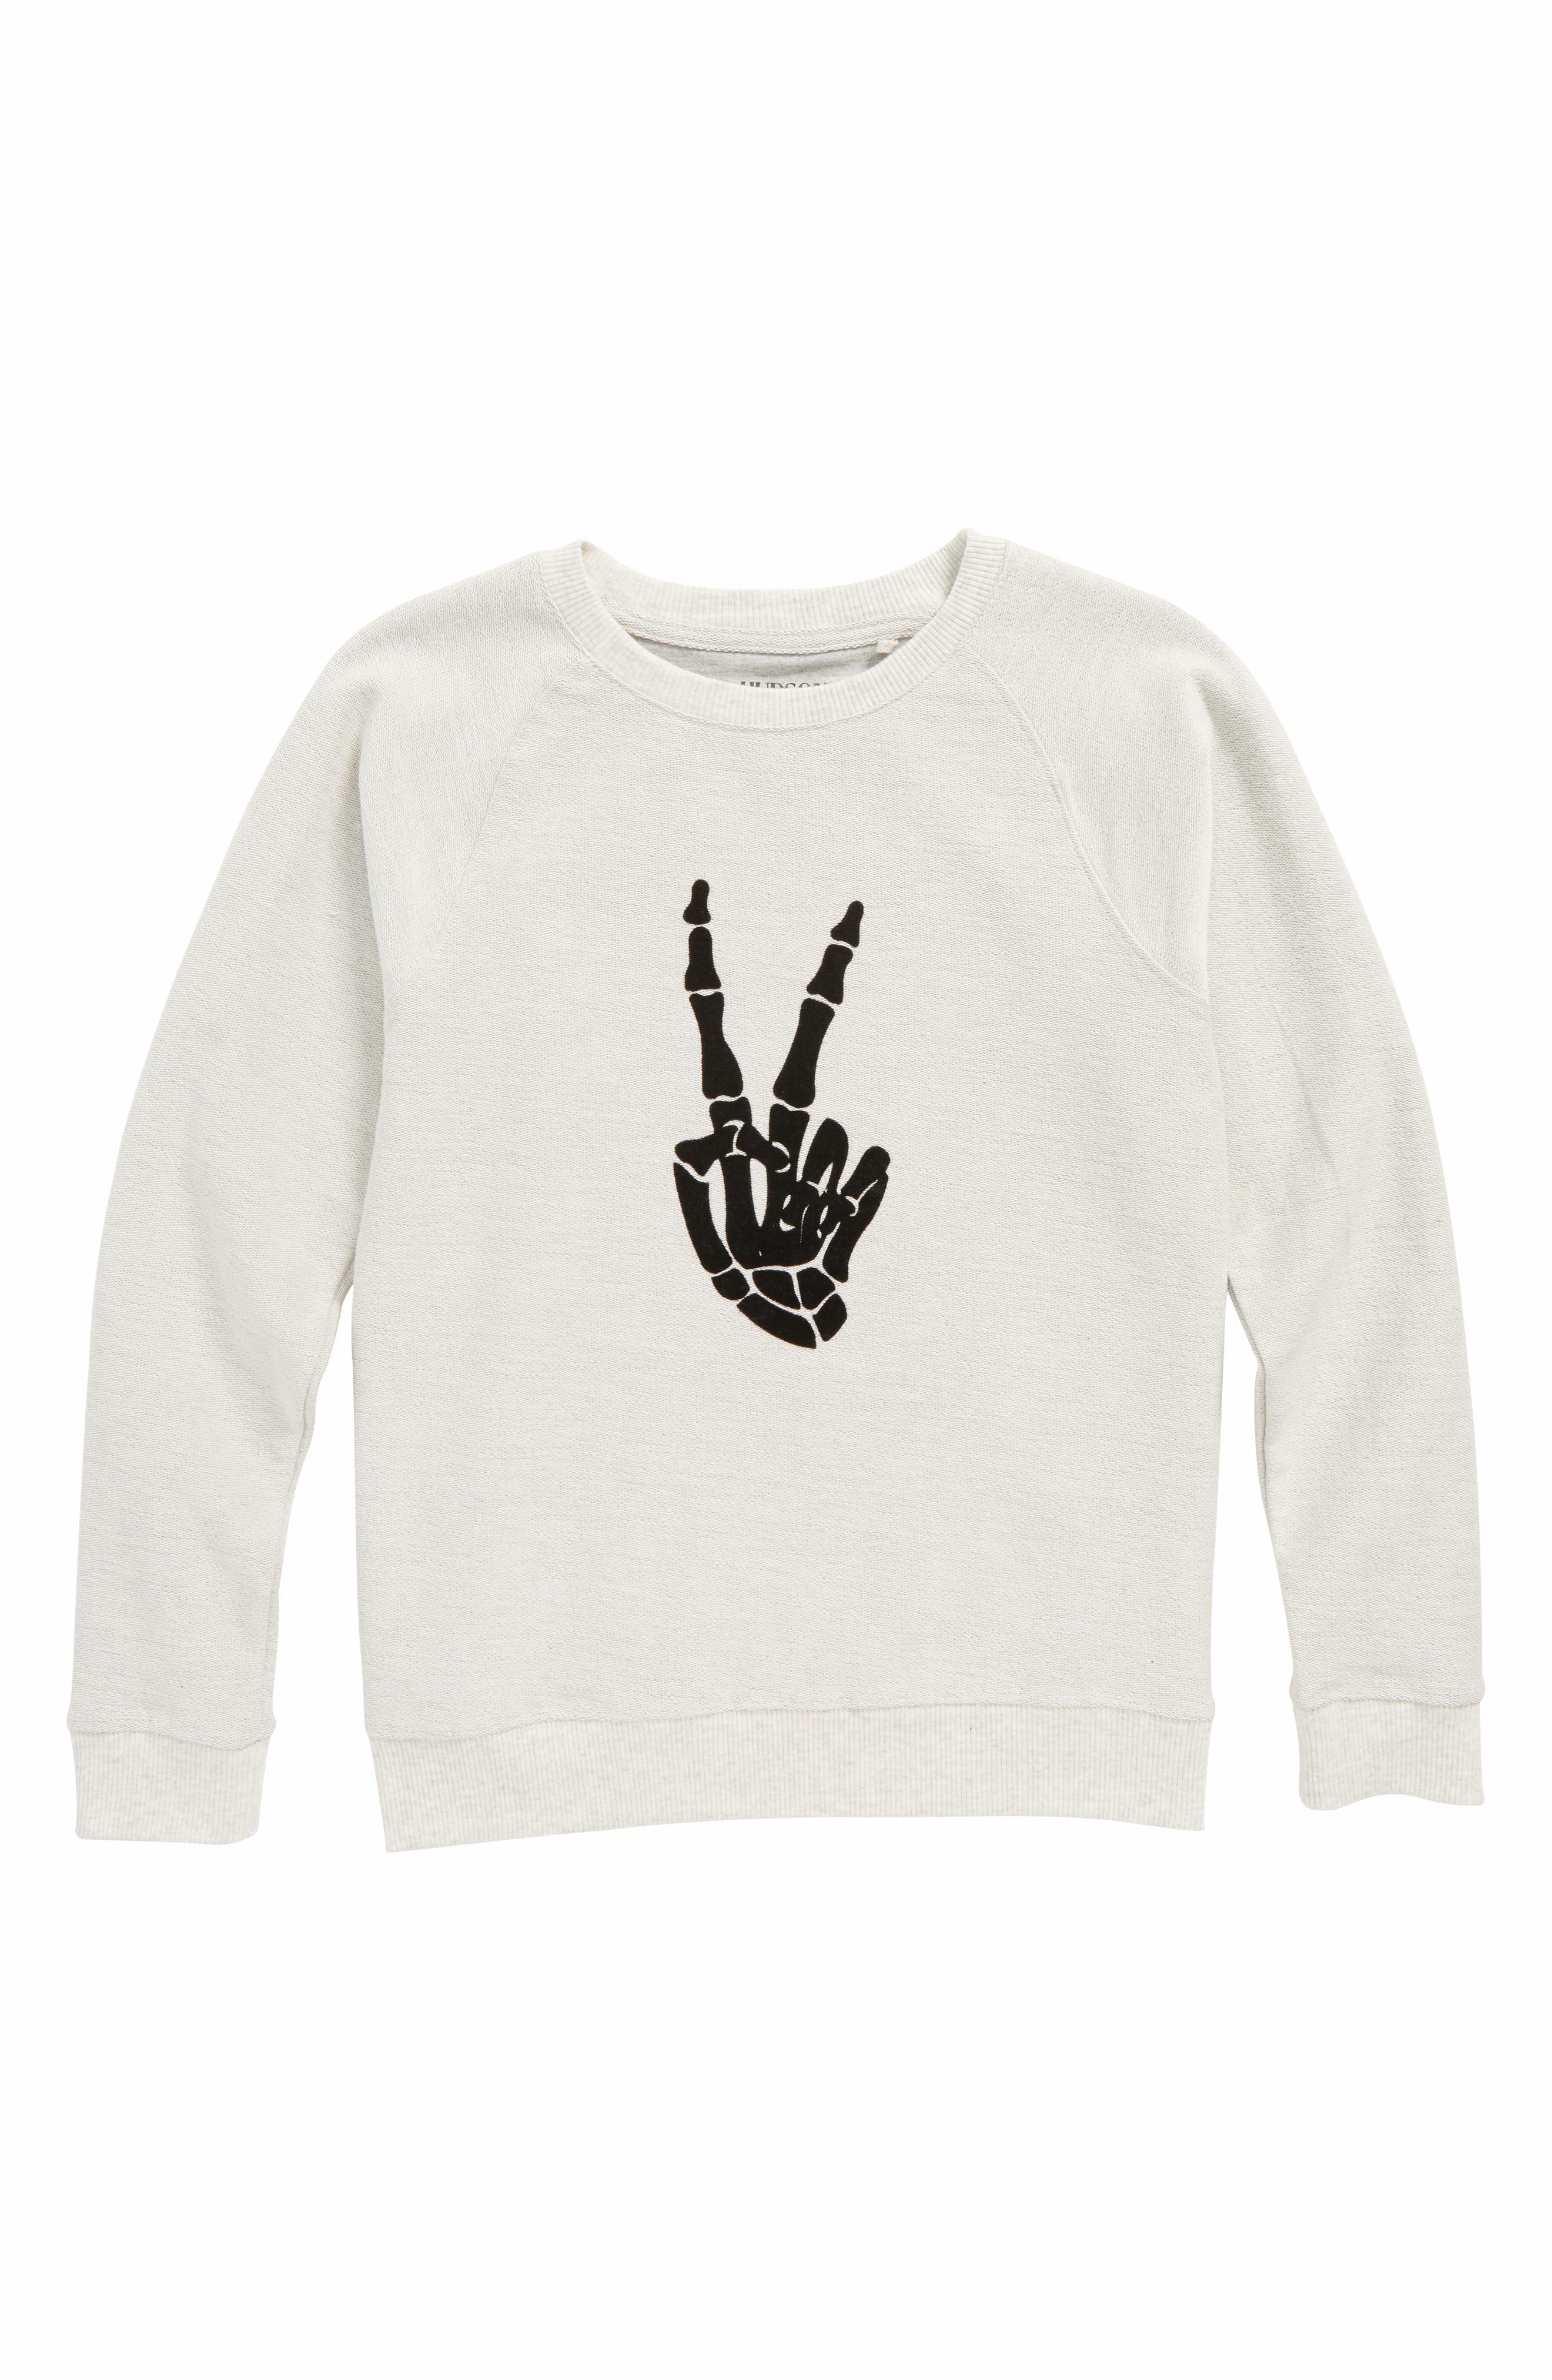 Vibes Graphic Sweatshirt,                             Main thumbnail 1, color,                             Quicksilver